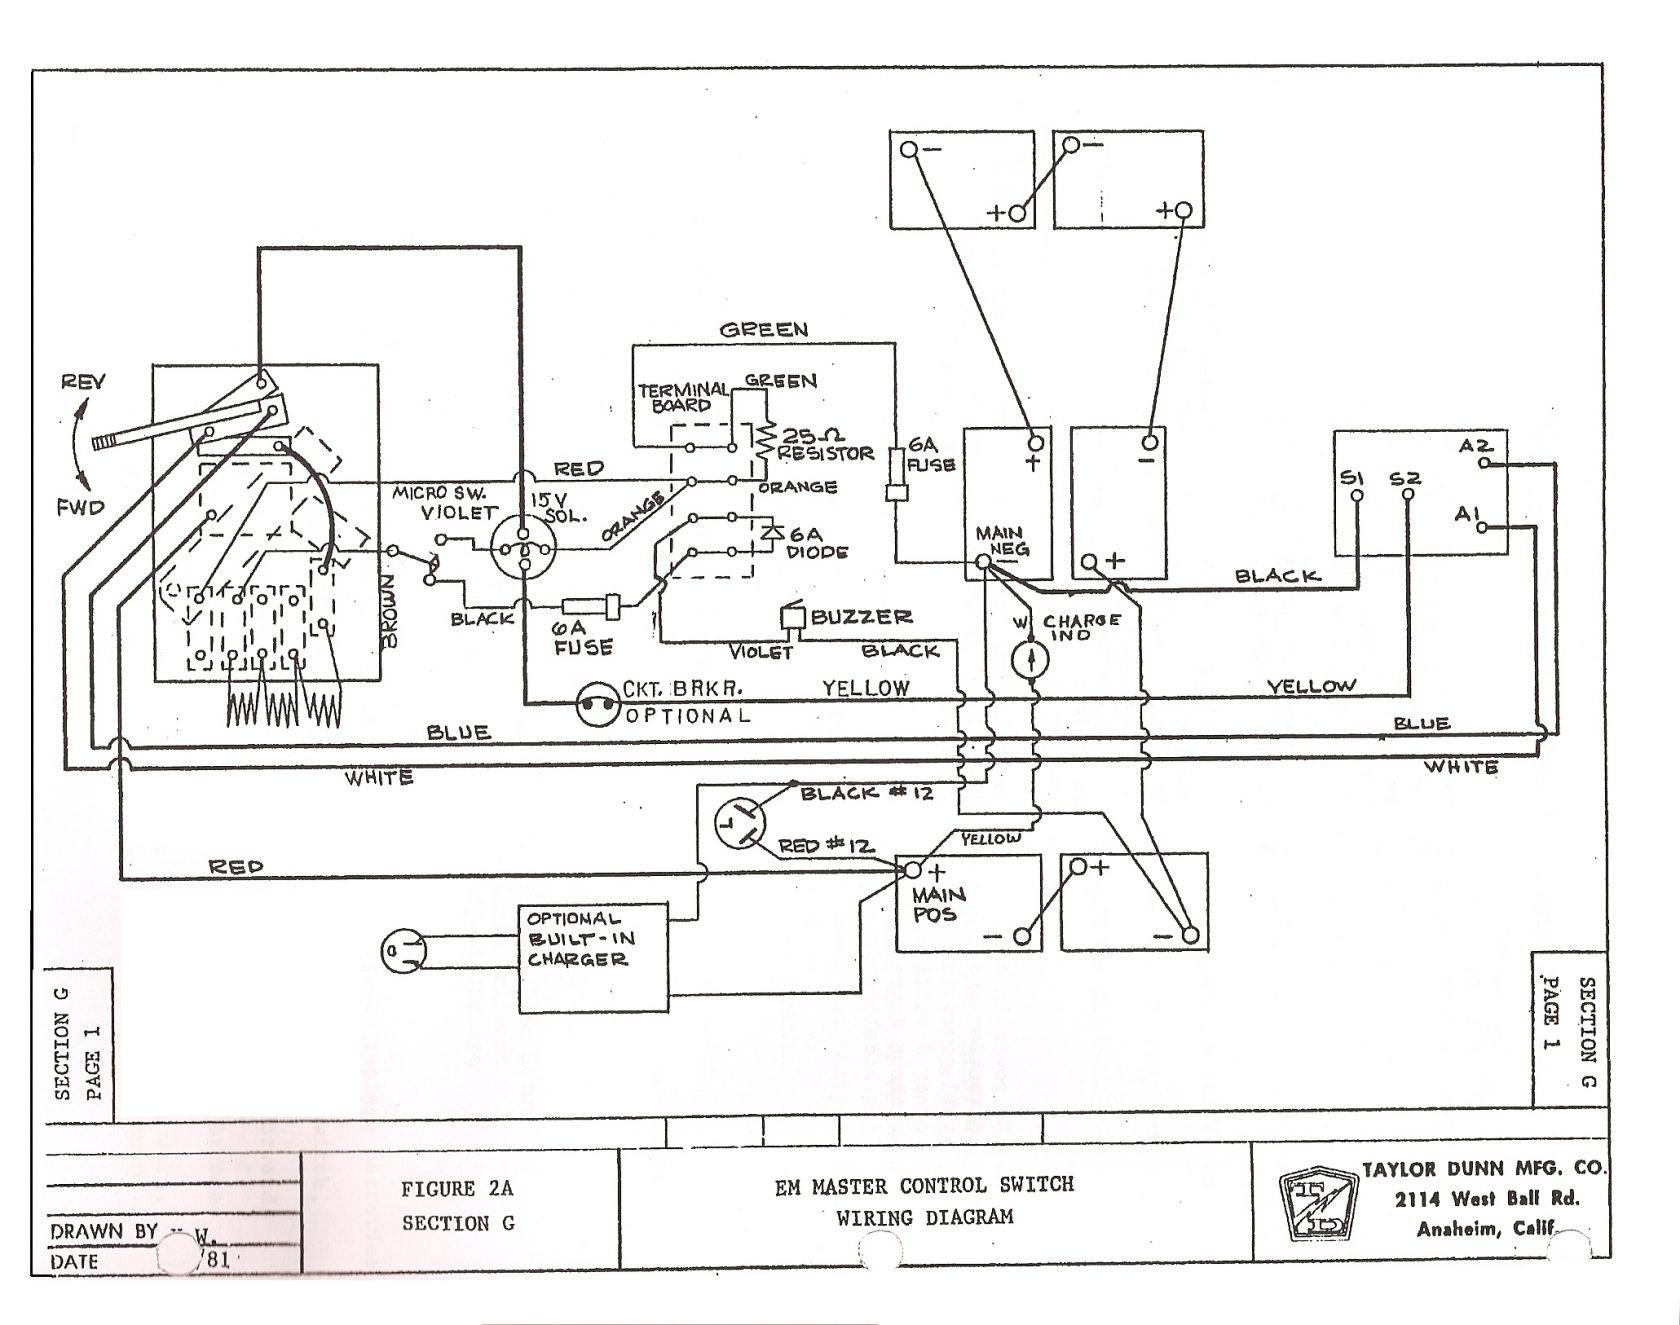 Ezgo Golf Cart Parts Diagram Wiring Diagram 48v Golf Cart Free Downloads Ez Go Parts Diagram Of Ezgo Golf Cart Parts Diagram